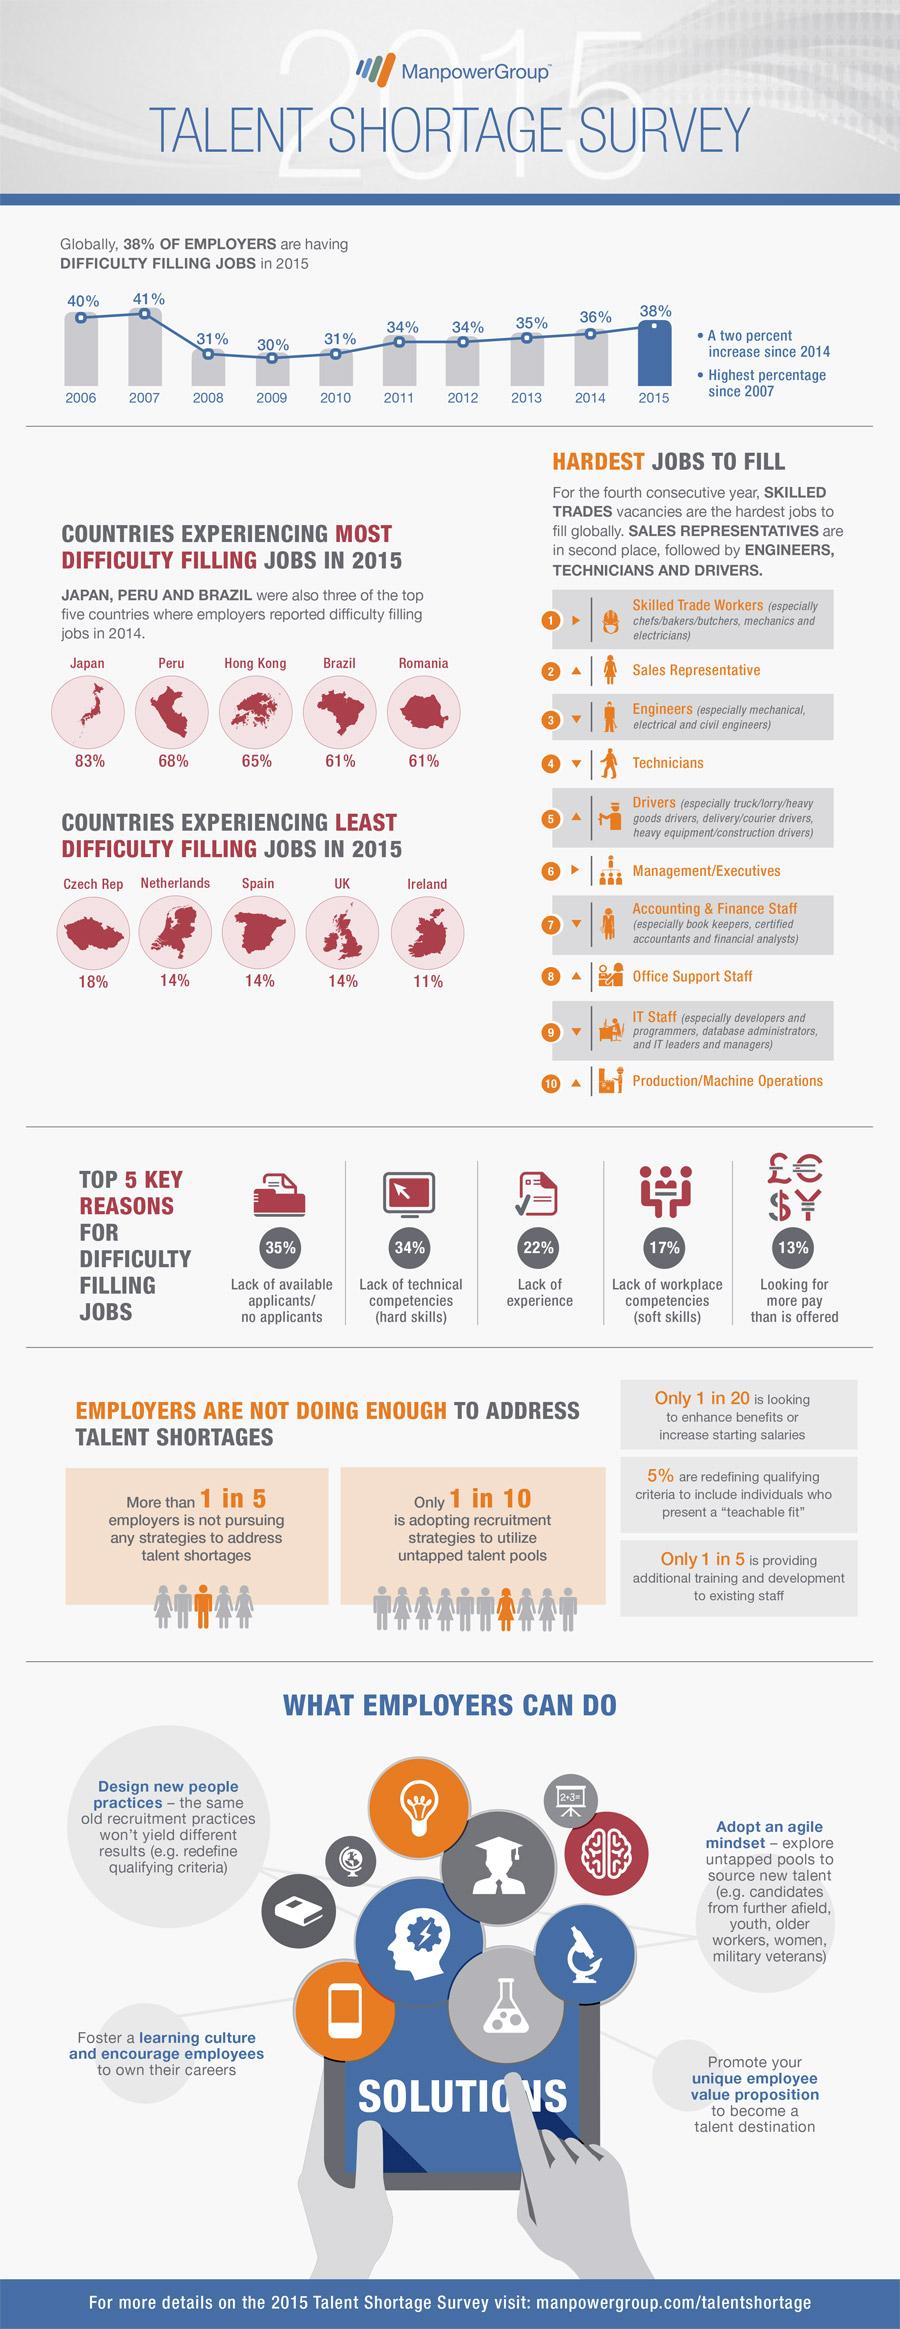 2015_Talent_Shortage_Survey_Infographic-lo_res